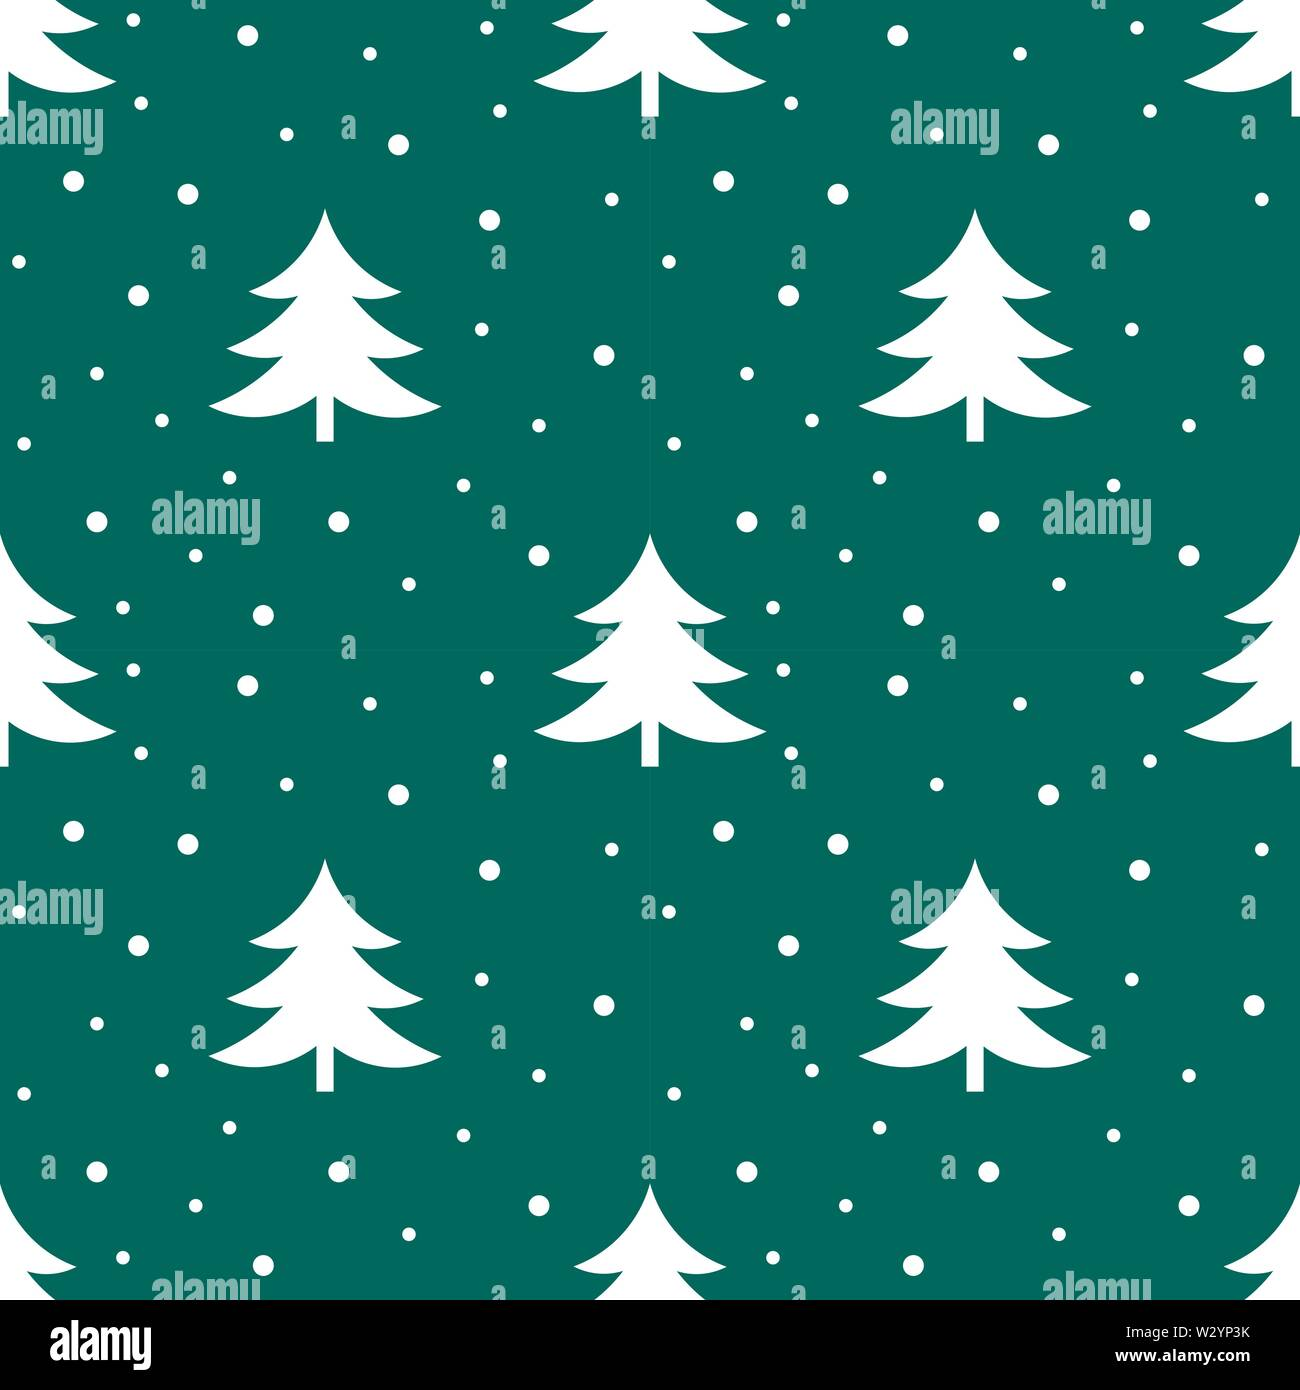 Christmas trees winter pattern. Vector illustration. - Stock Image